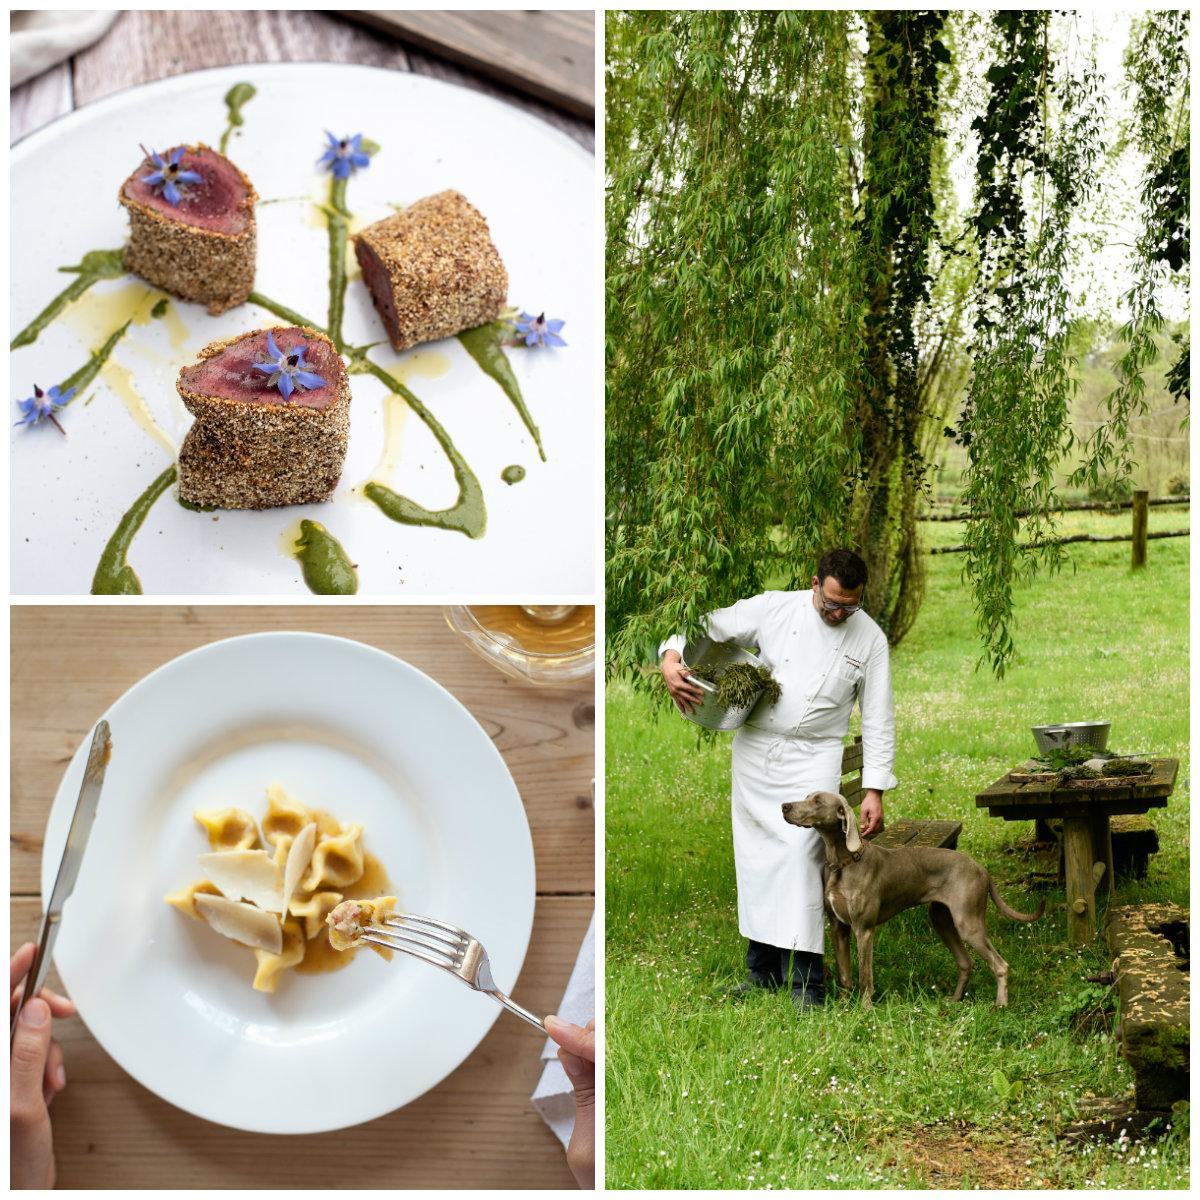 la-subida-intervista-foodlifestyle